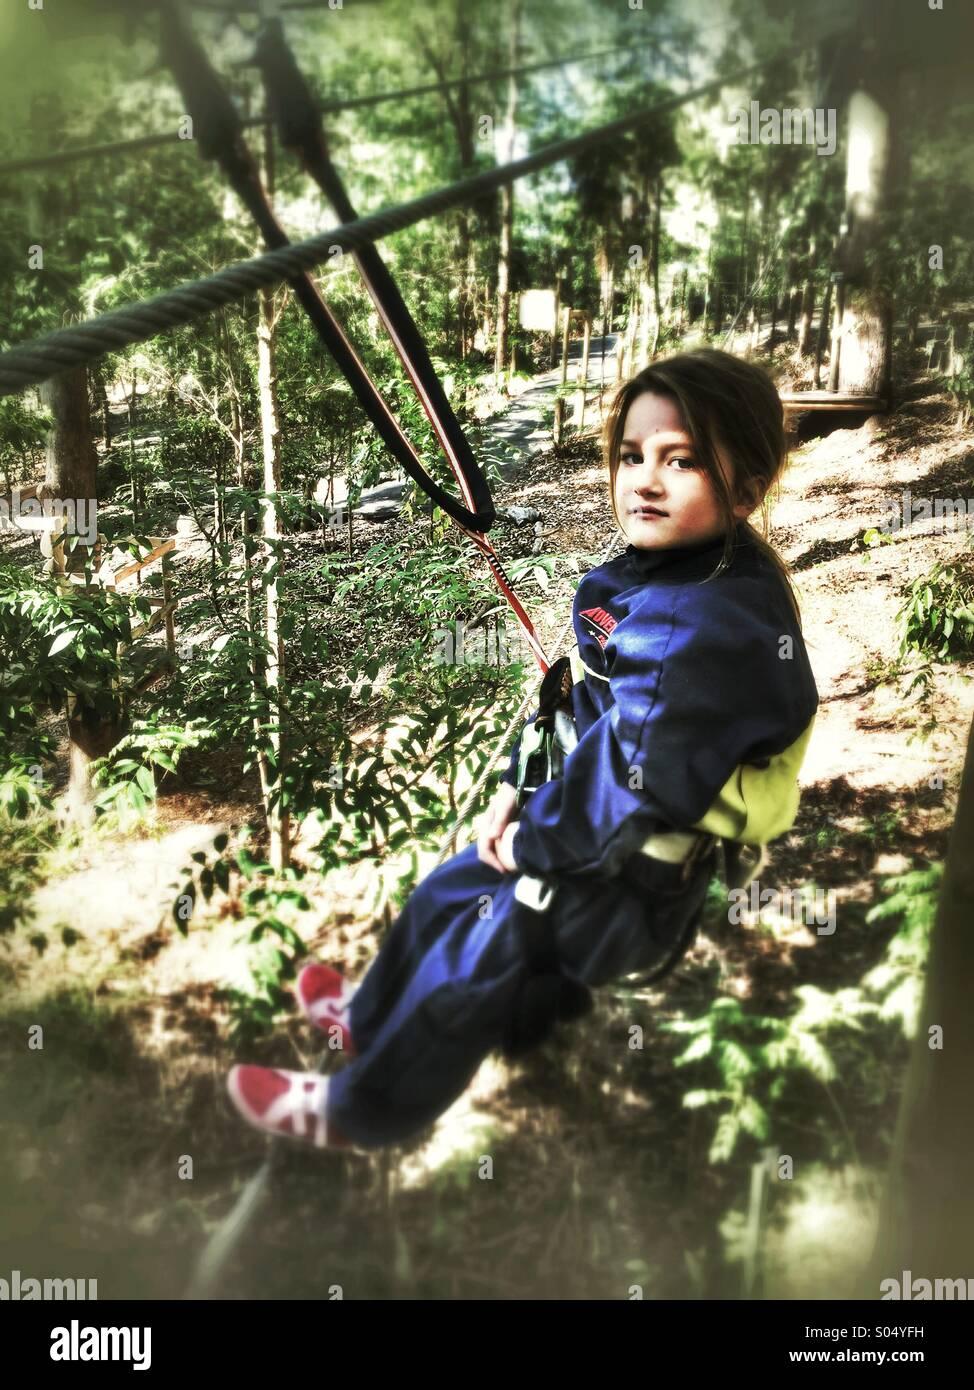 Young girl tree climbing - Stock Image